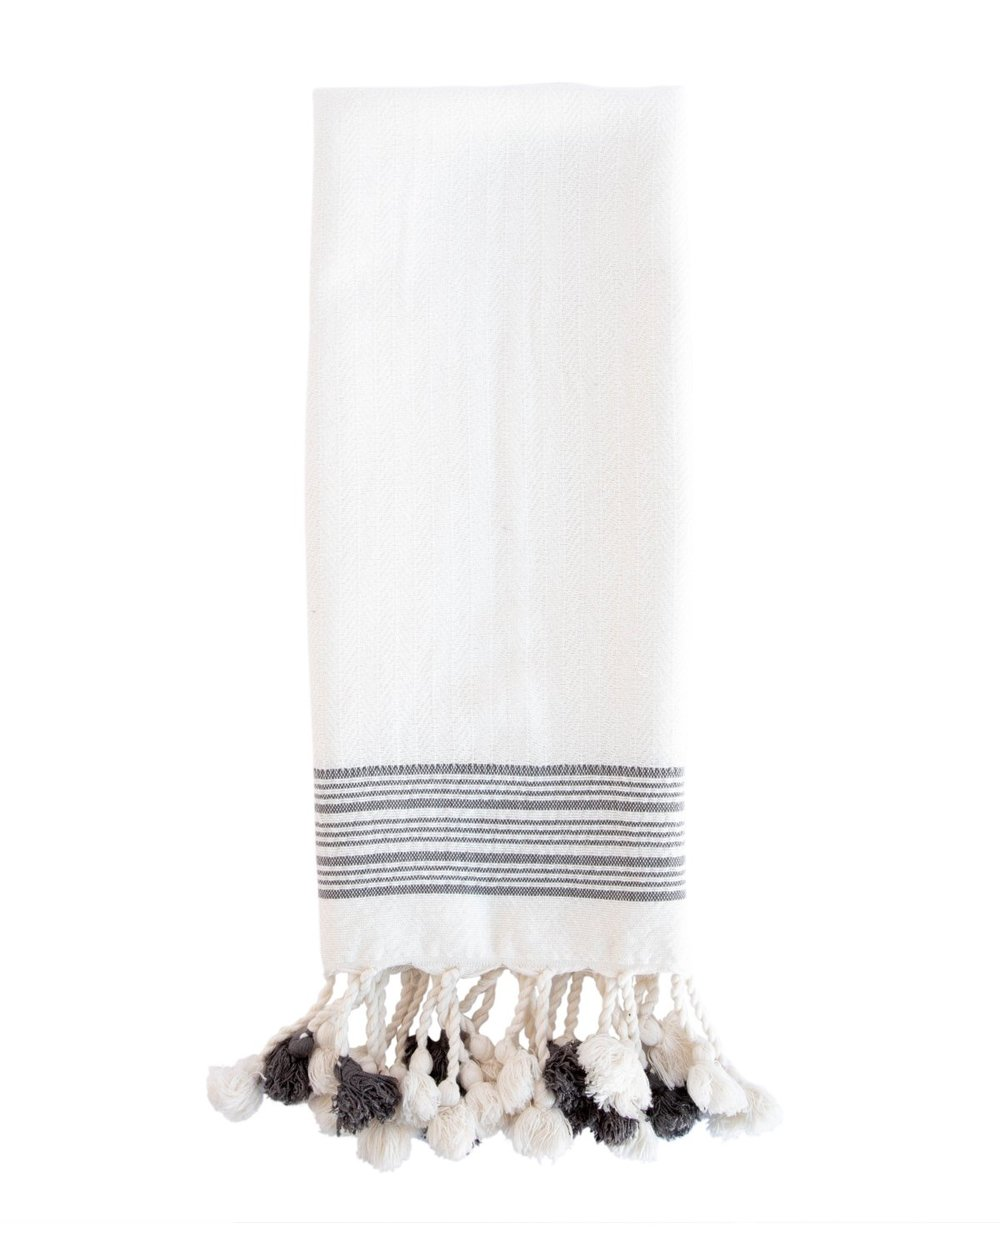 Hadleigh_Hand_Towel_5.jpg